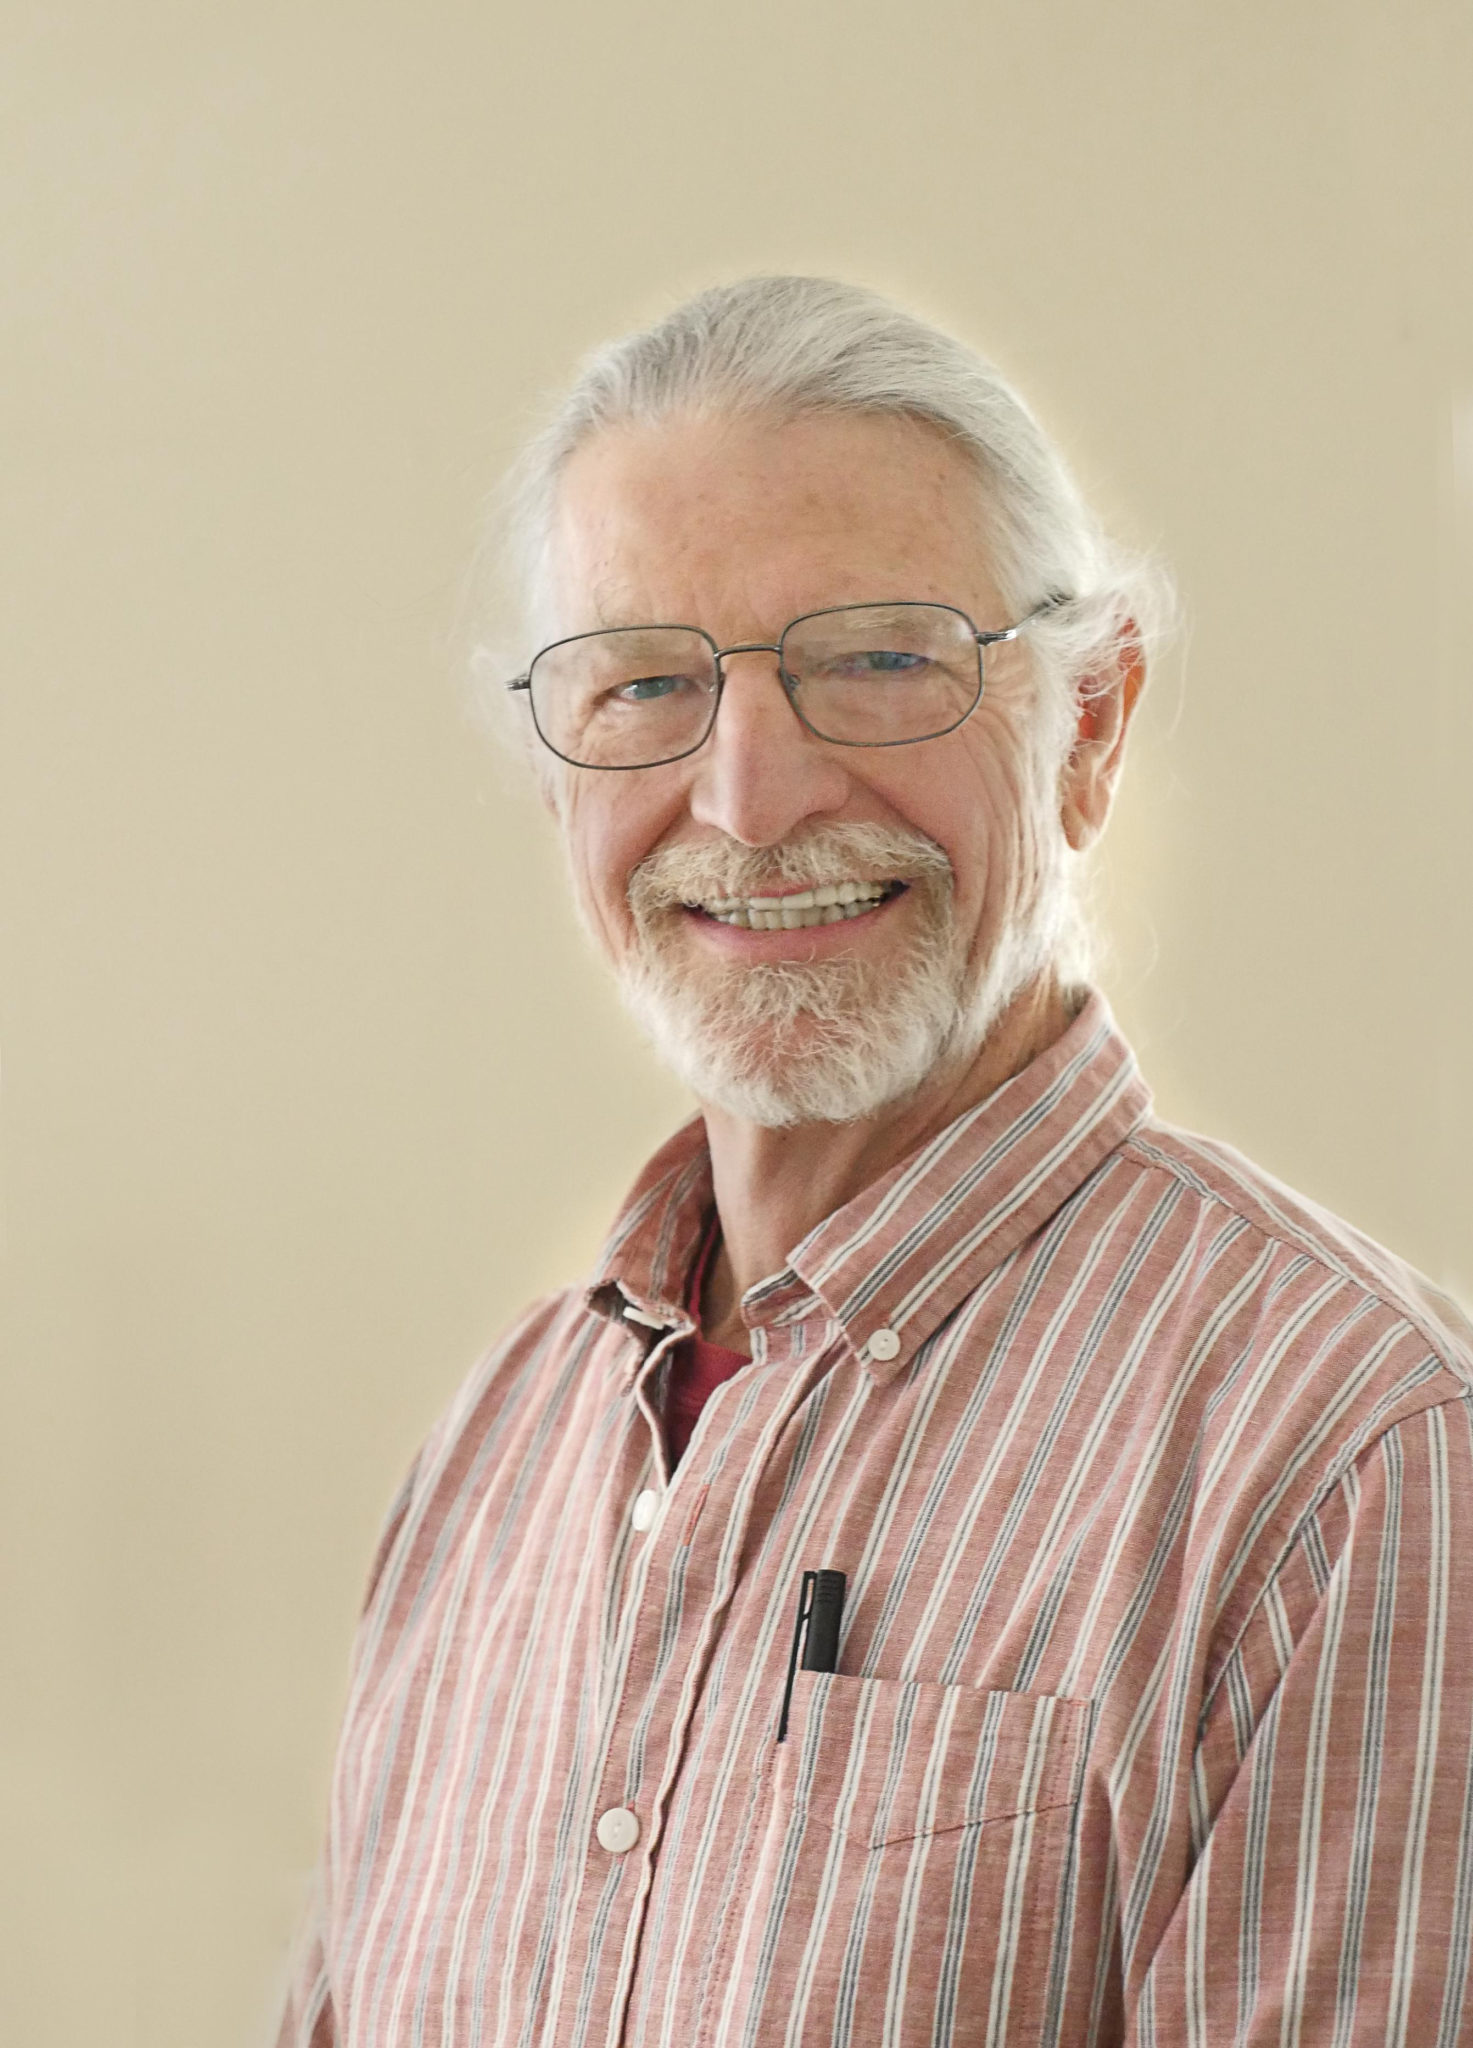 Portrait of Charles Simpson